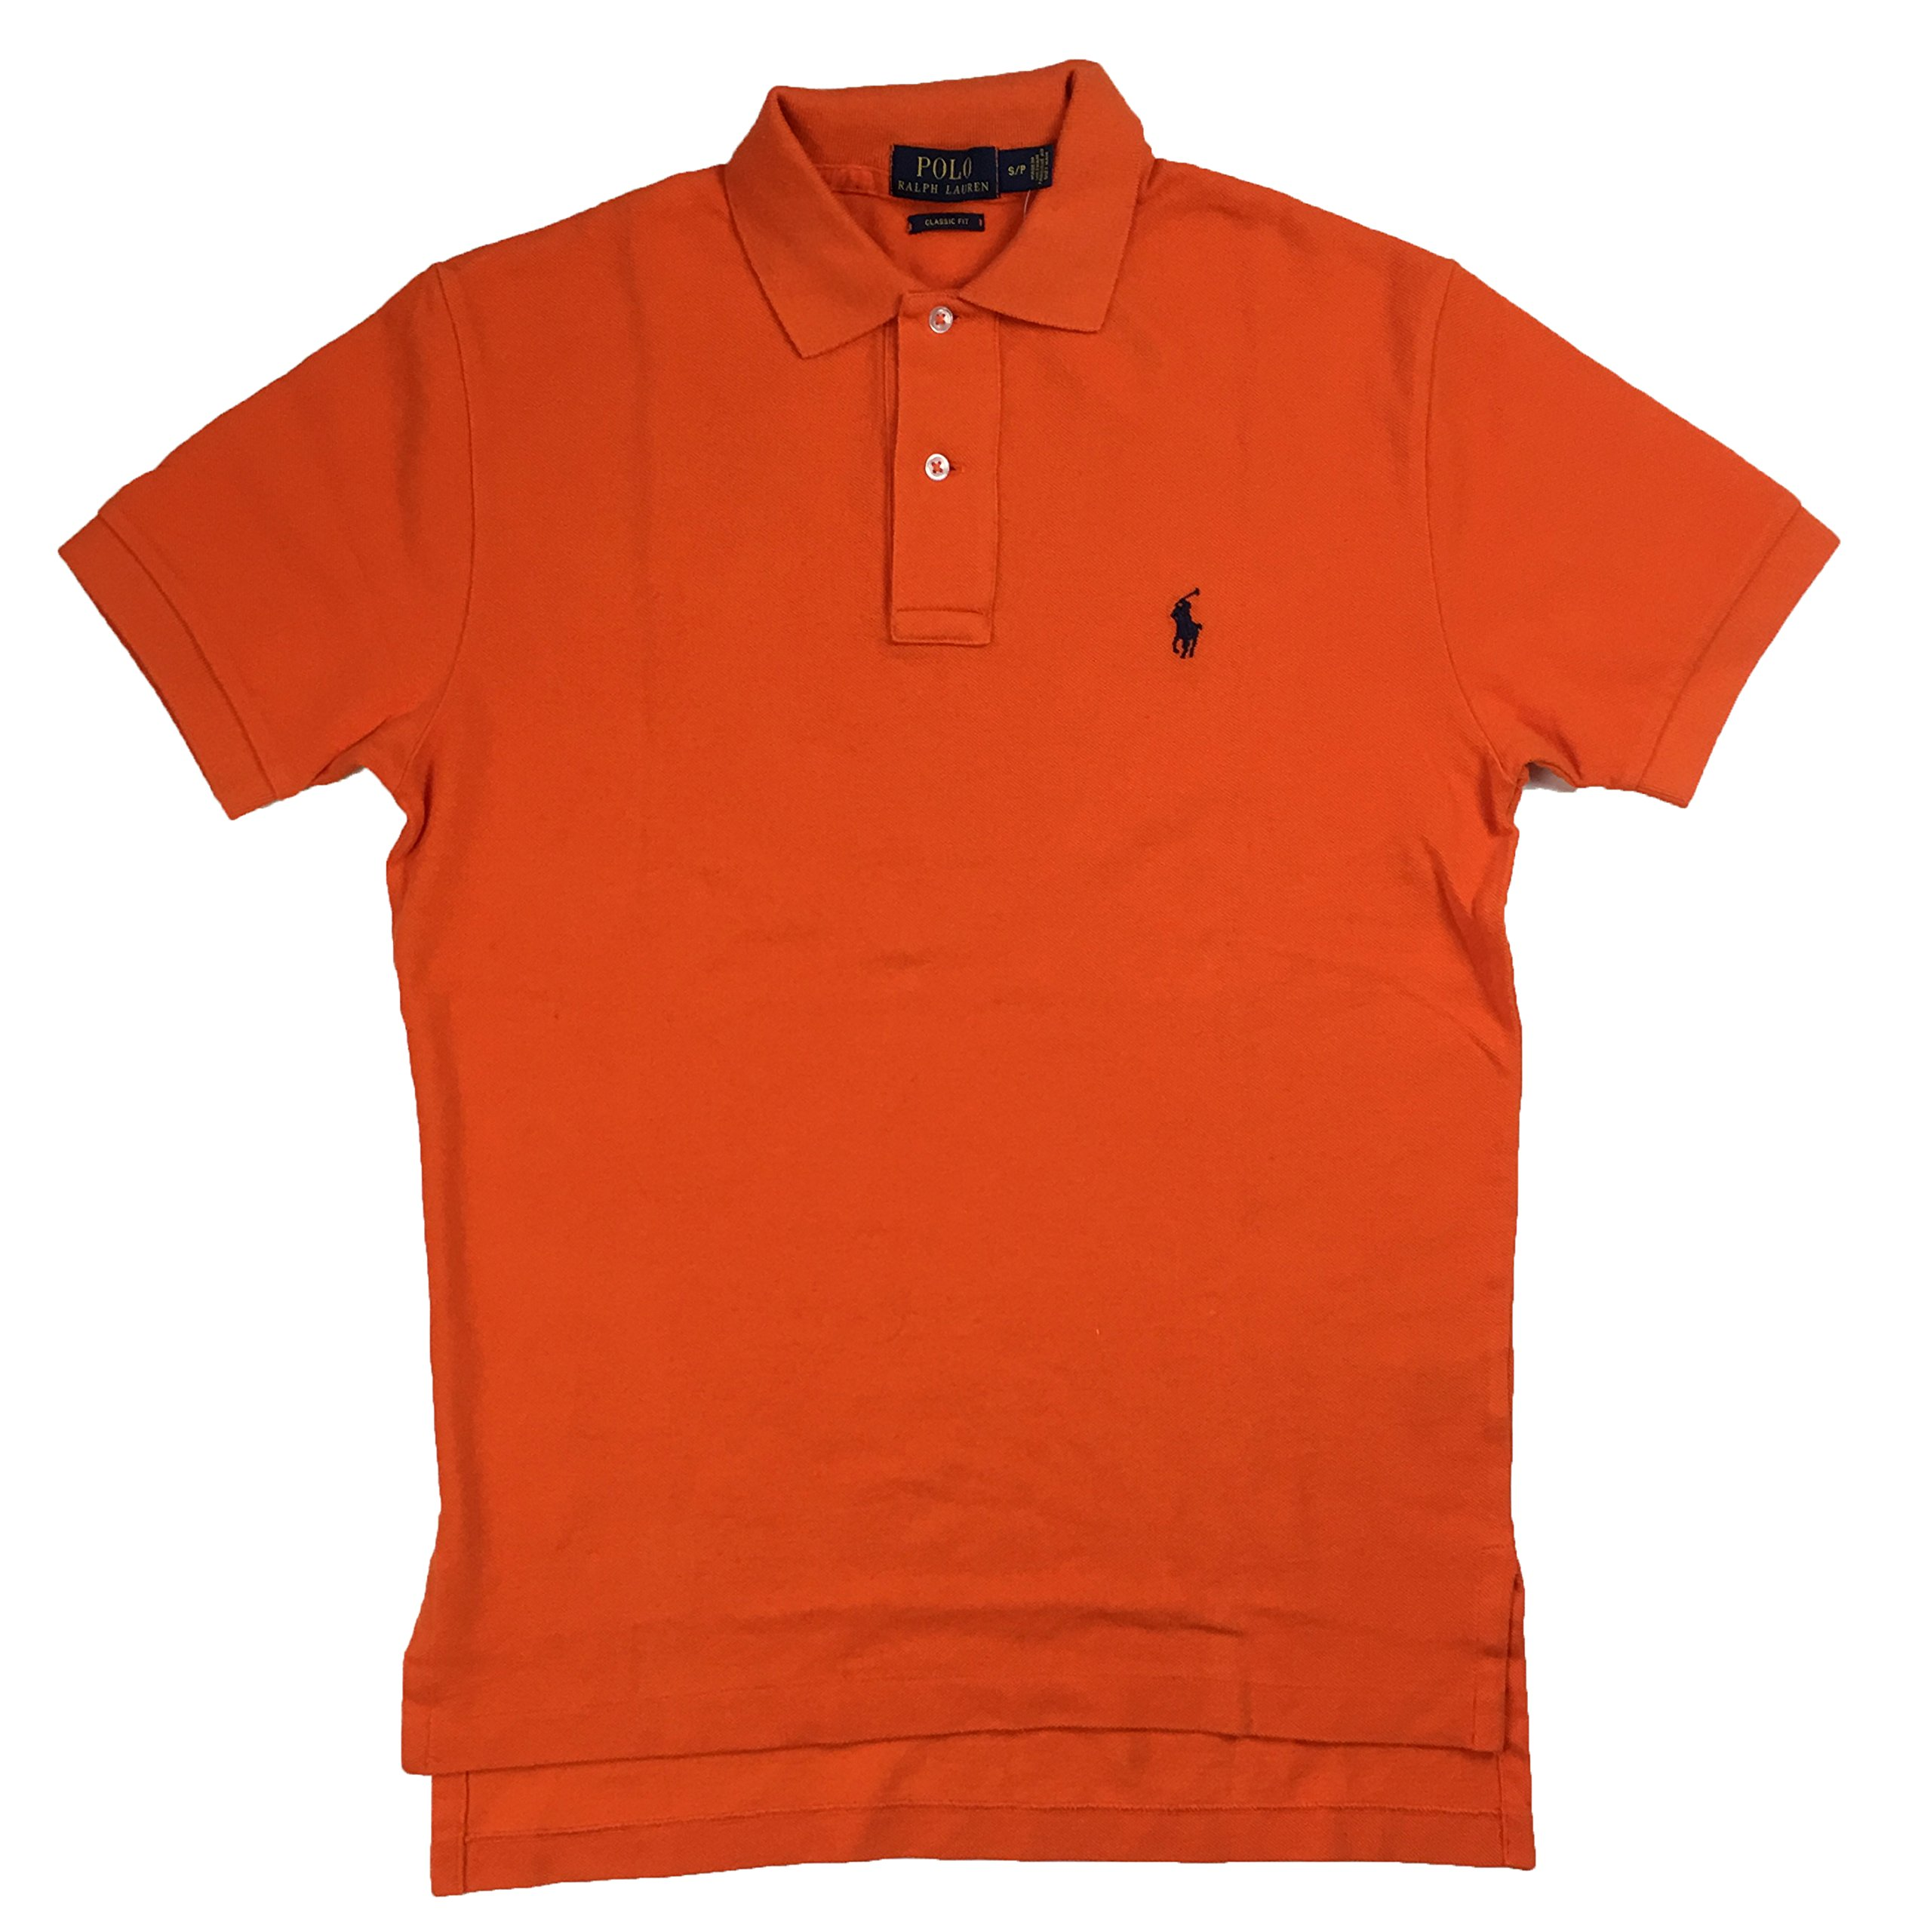 Polo Ralph Lauren Classic Fit Mesh Polo, Basketball Orange, Small